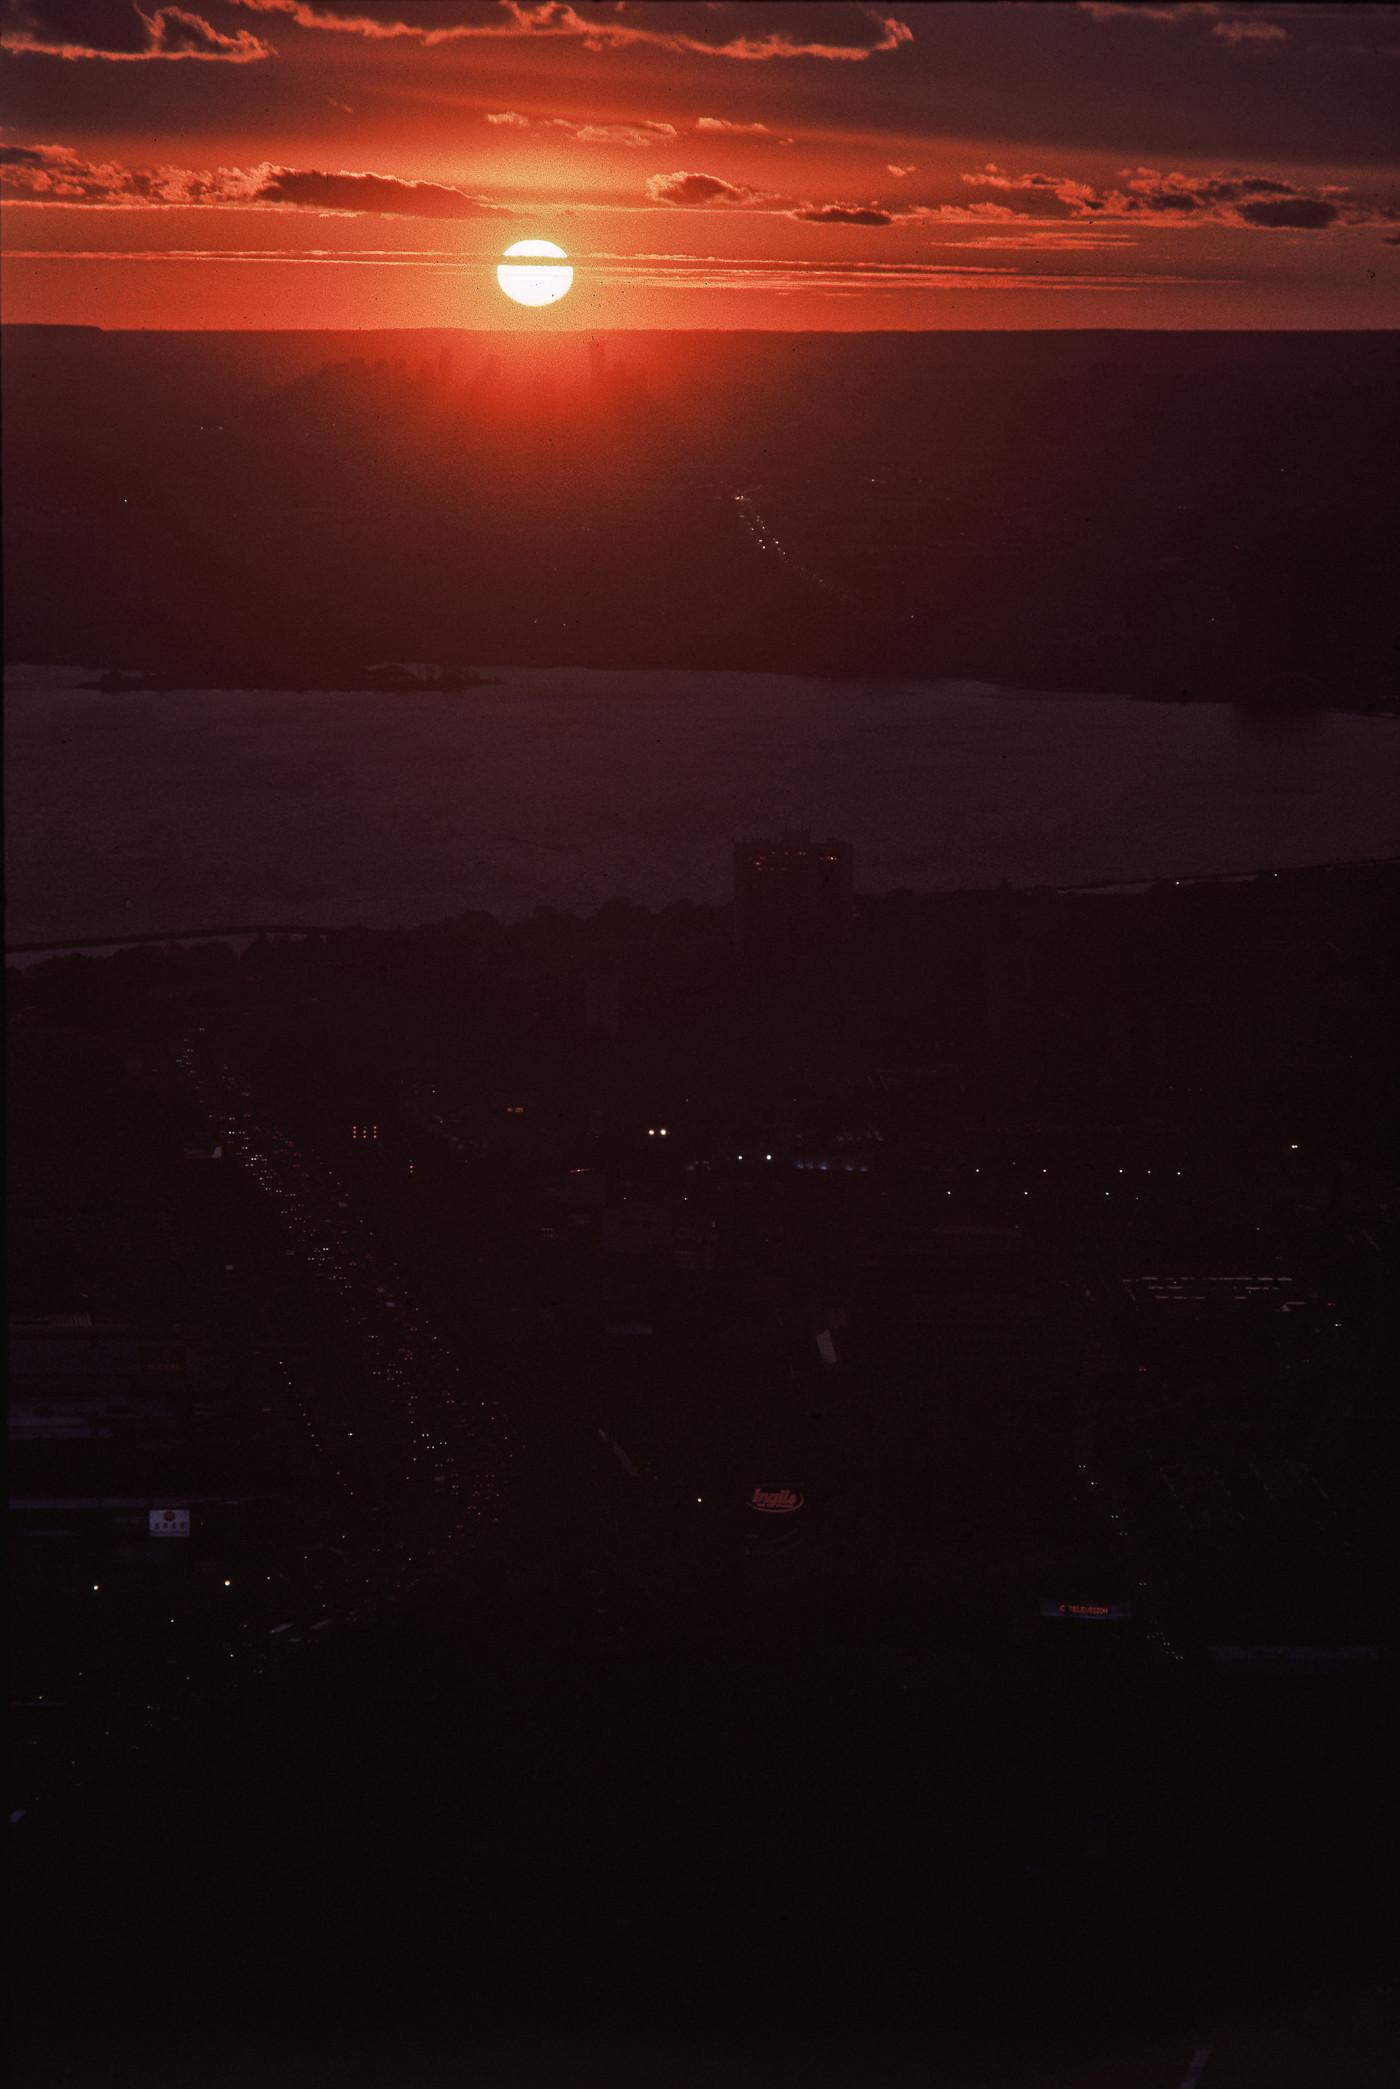 Saugahenge, 18:25 (in Kodachrome 64), 22 October 2010